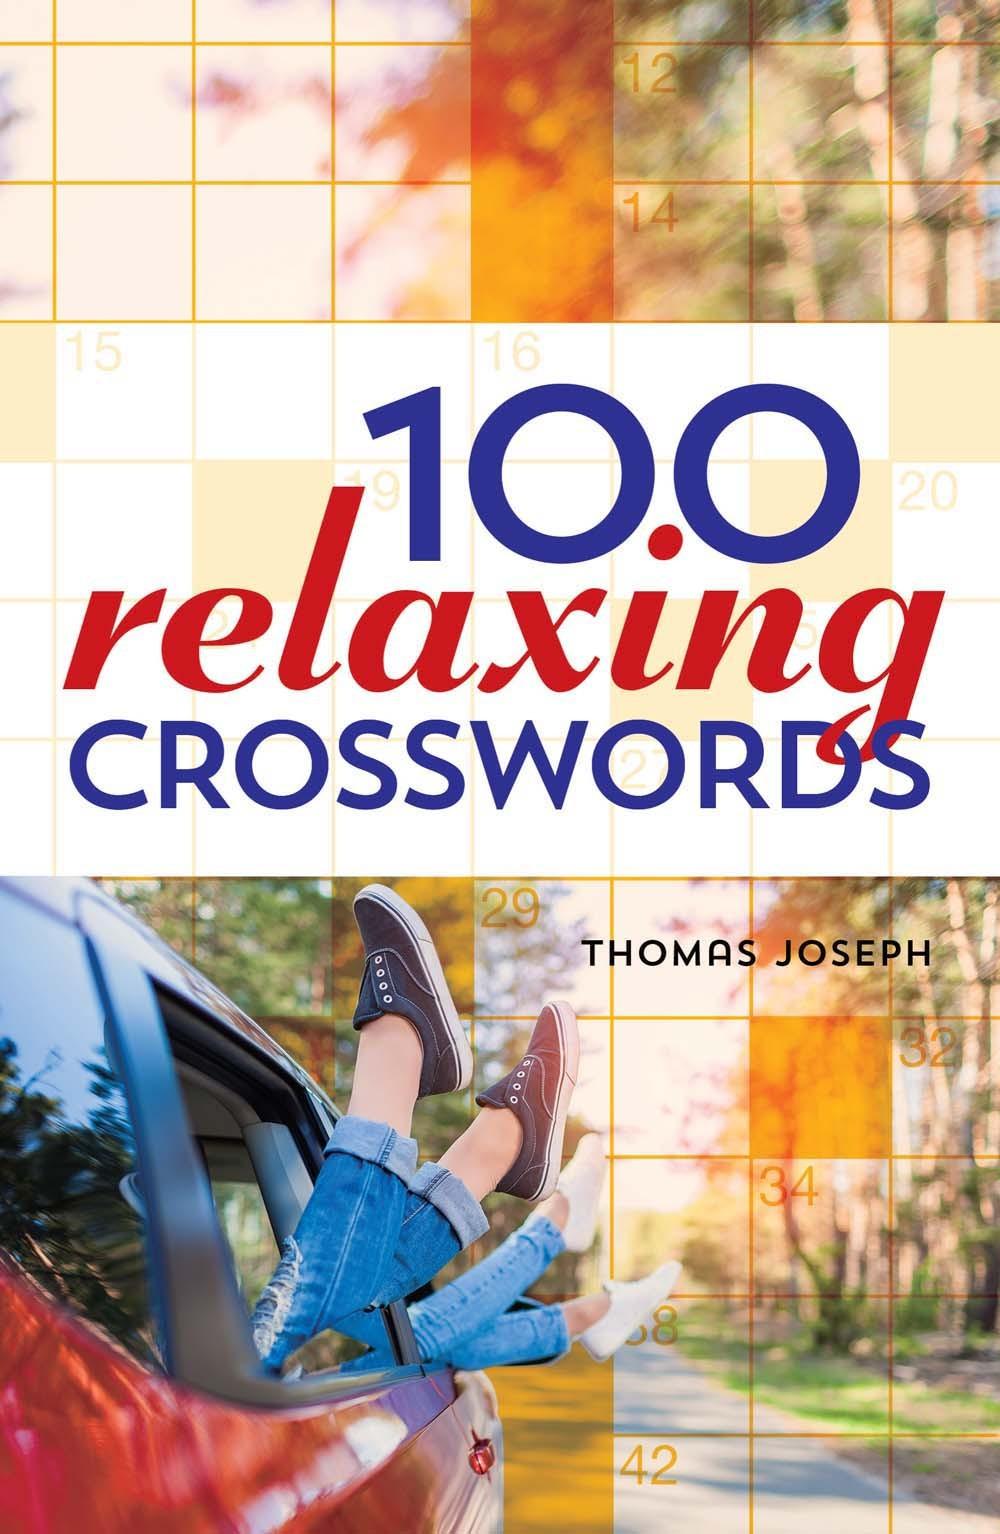 100 Relaxing Crosswords Thomas Joseph